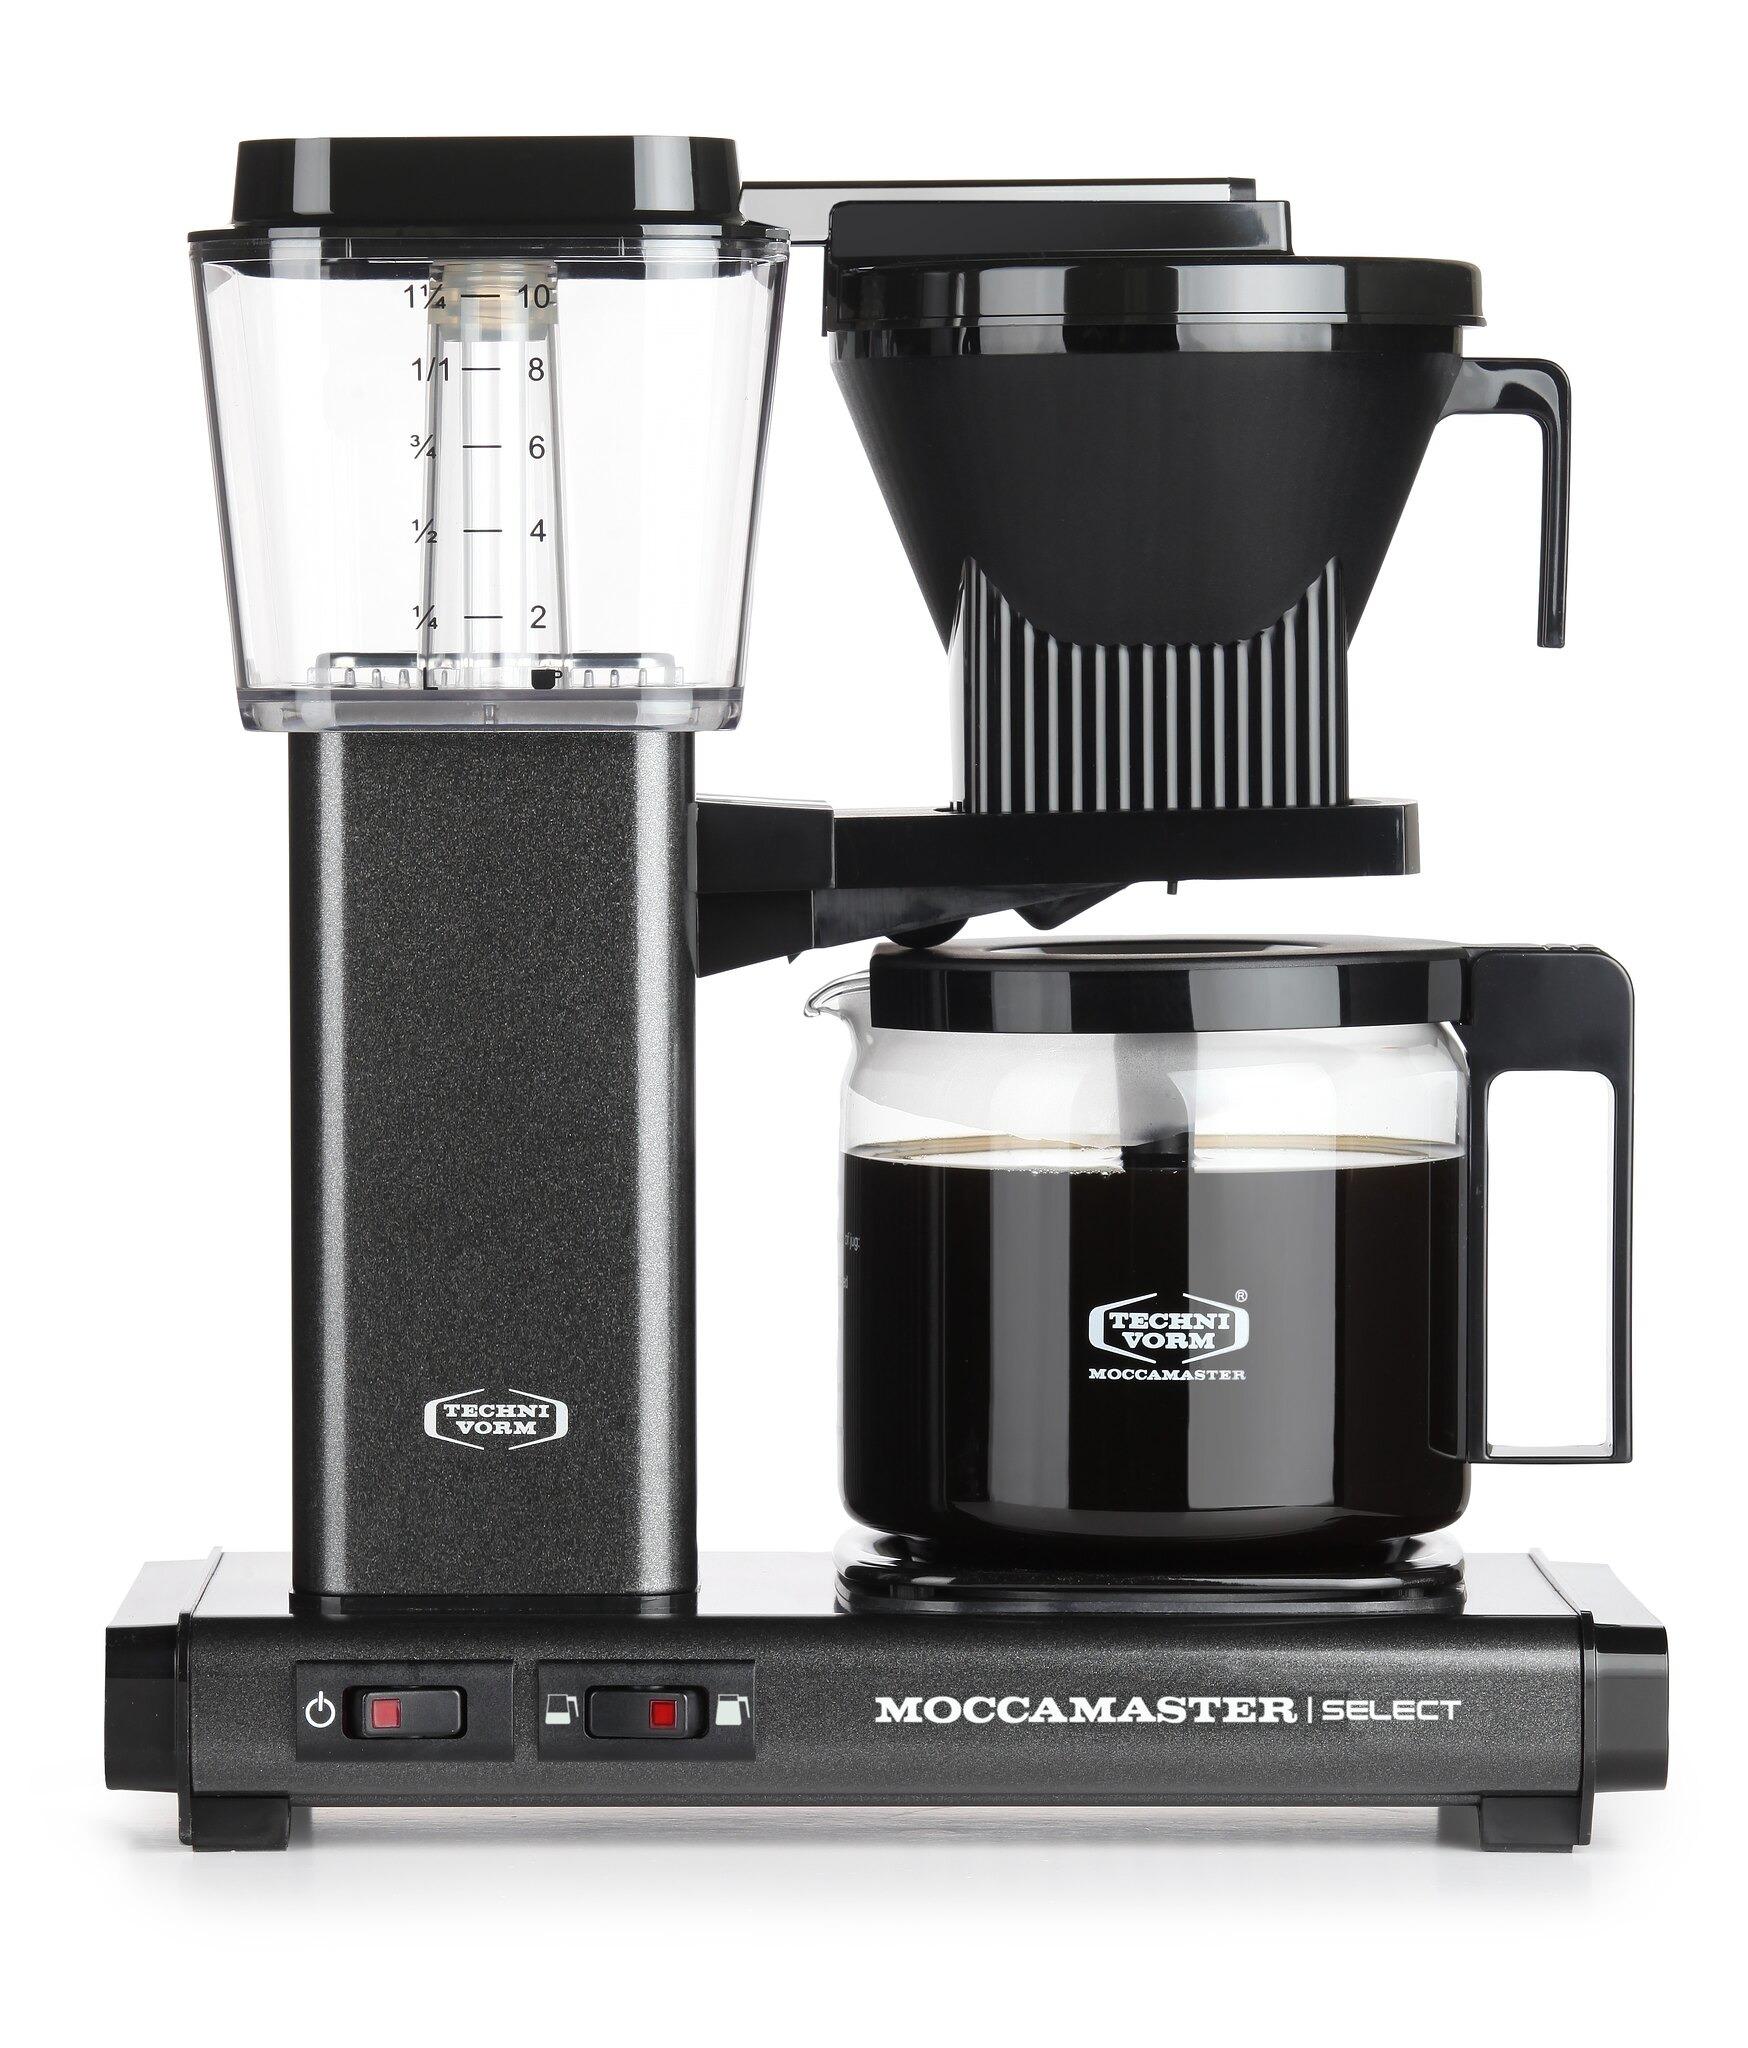 Moccamaster koffiefilter apparaat KBG SELECT antraciet kopen